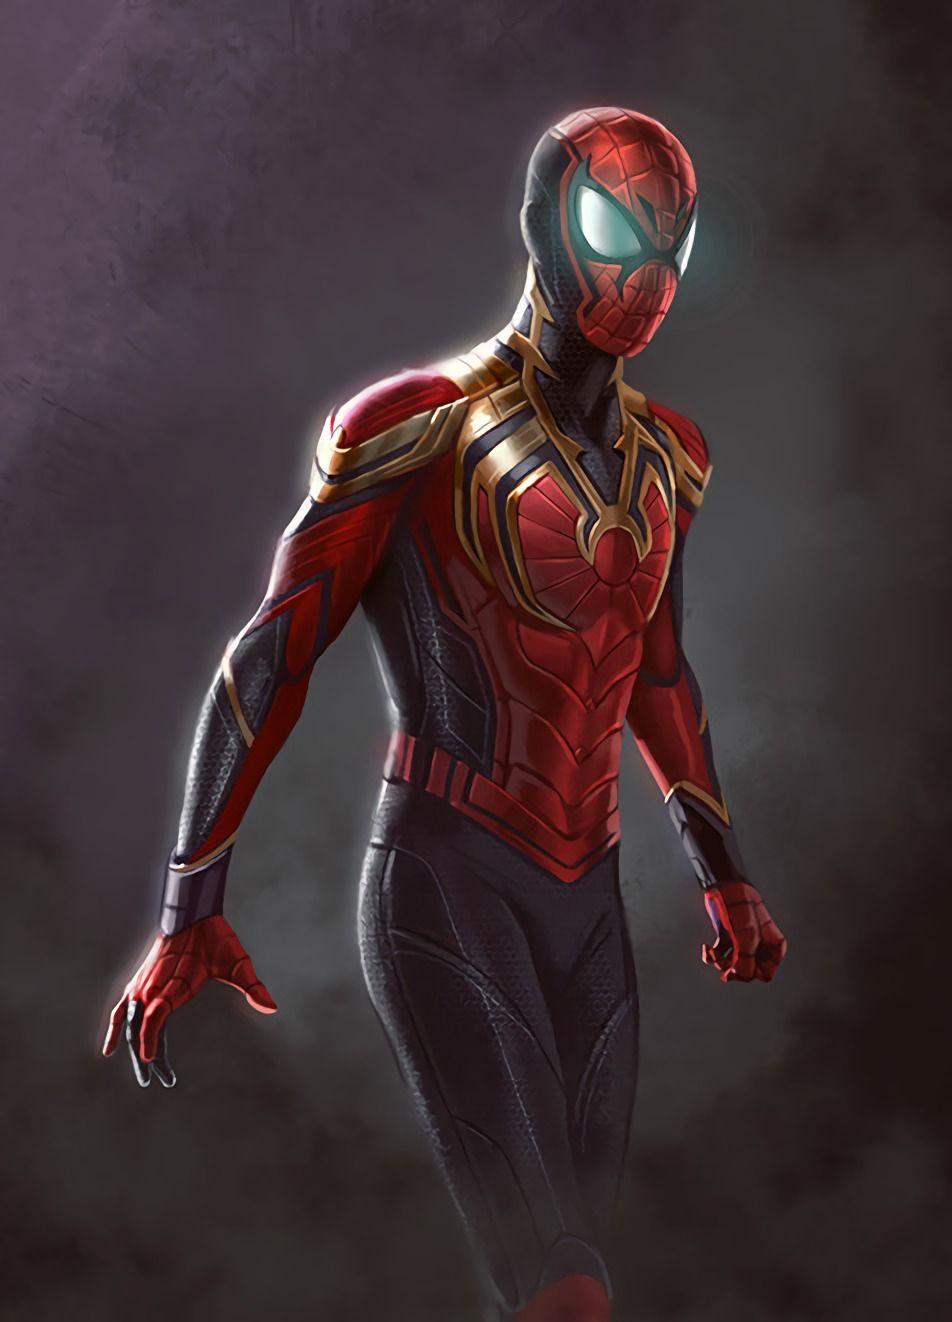 Spider-man Wakanda vibranium armor concept art. | MARVEL | Pinterest …